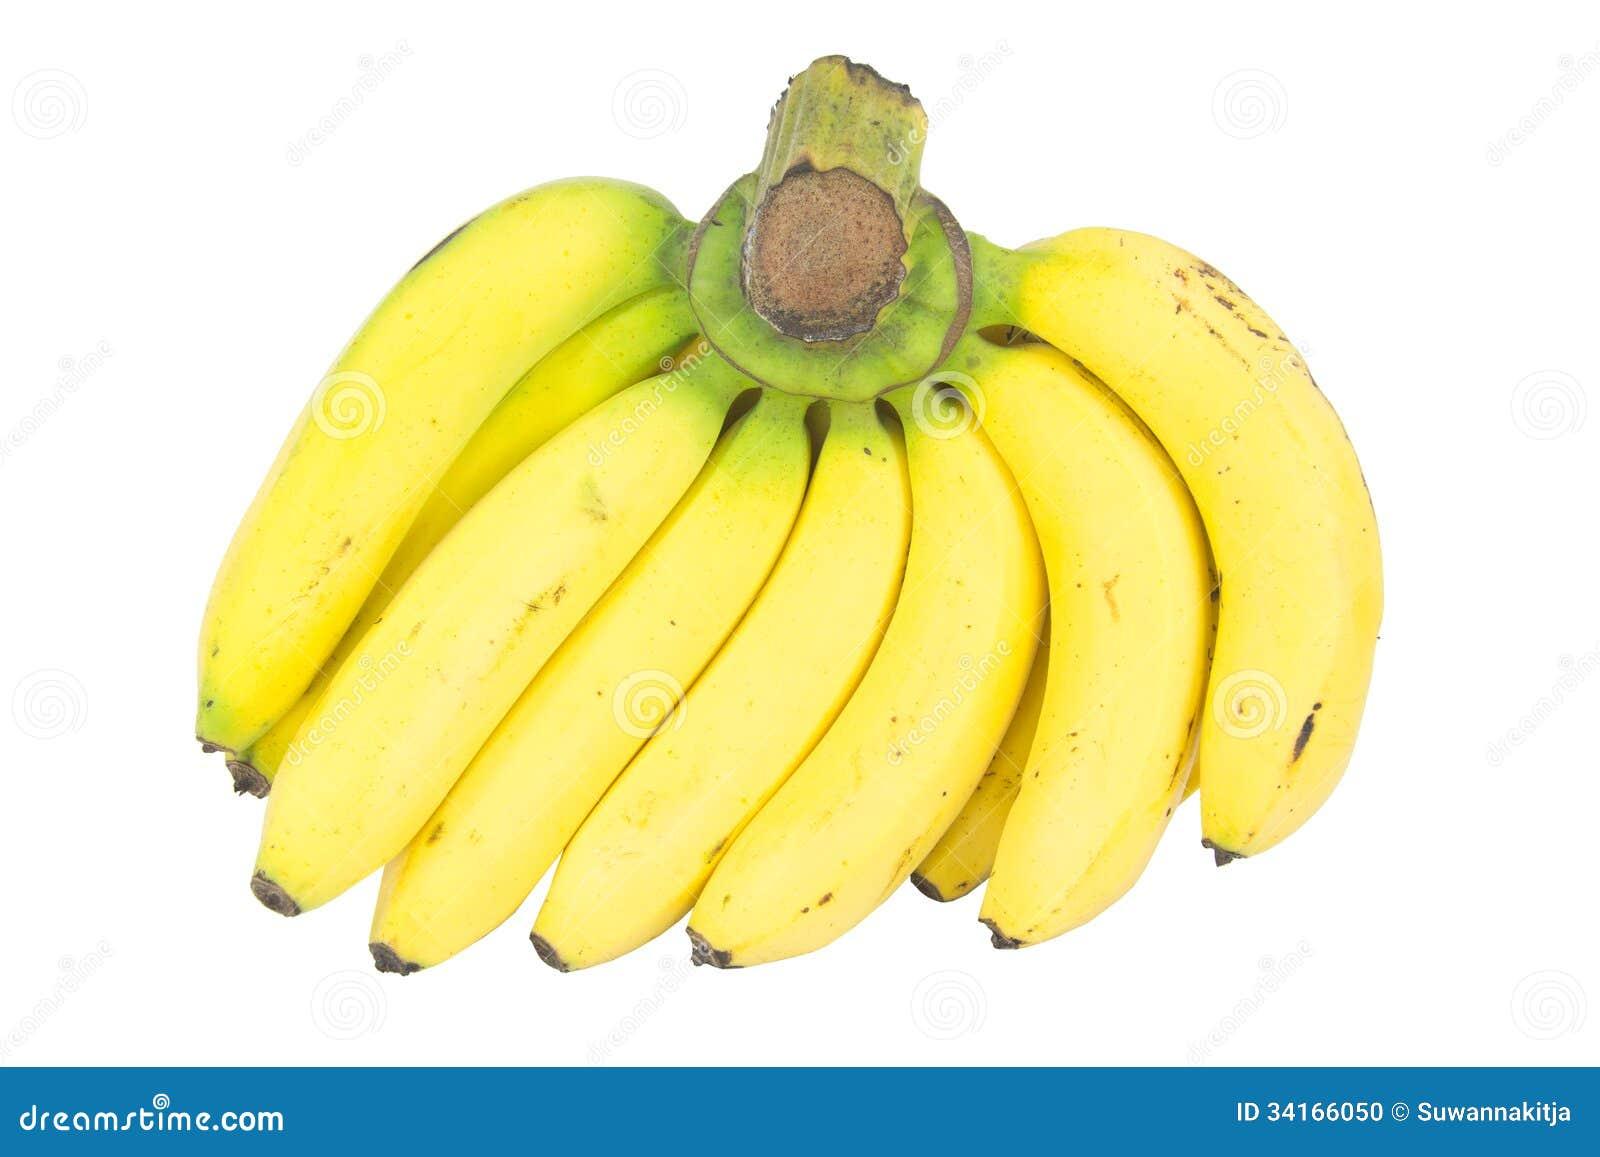 Banana Bunch Isolated On White Stock Photo - Image: 34166050